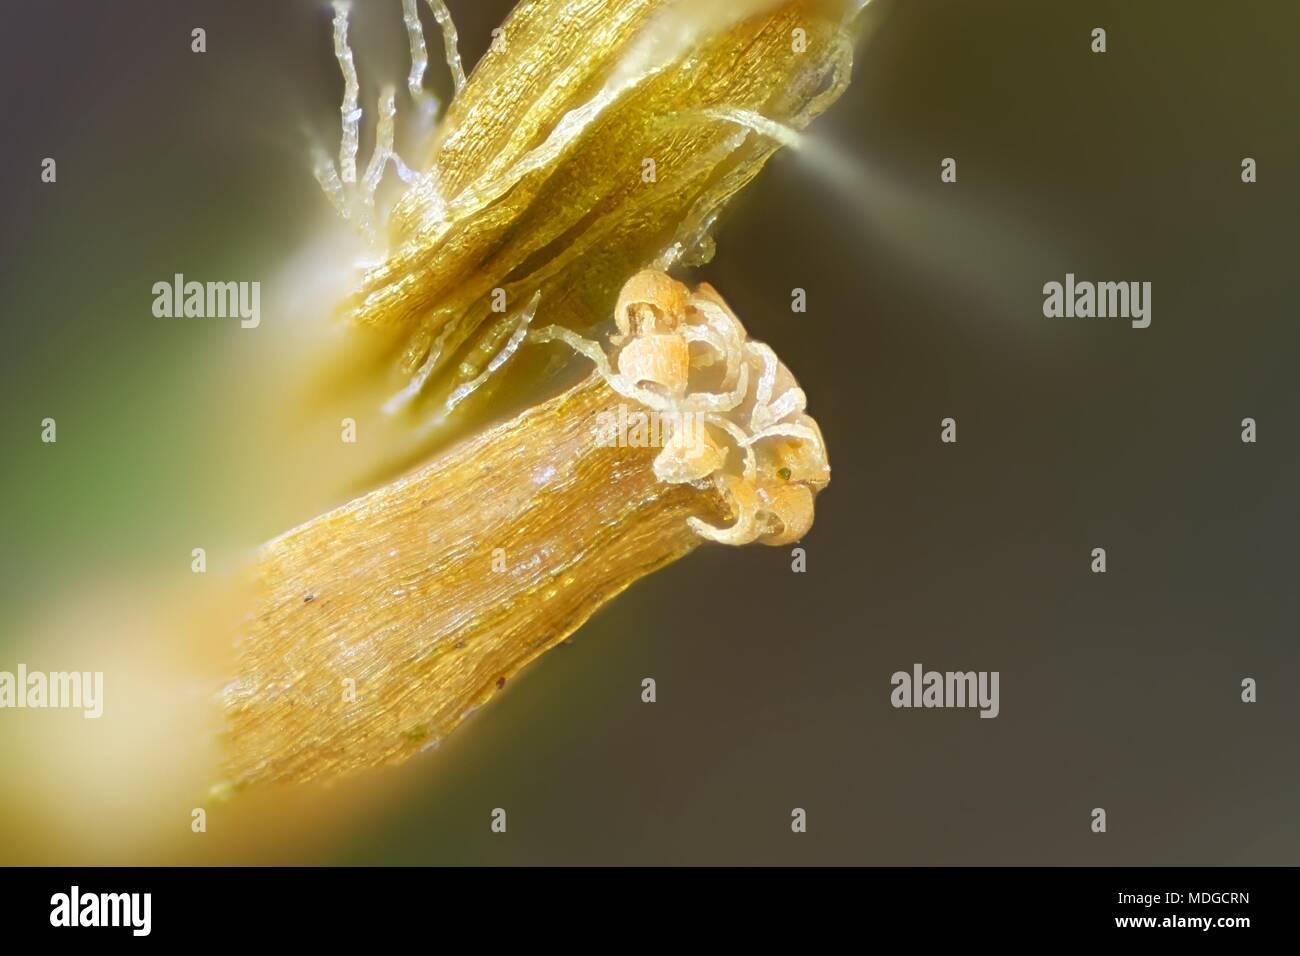 Spore capsule of lanceolateleaf rock moss,  Orthotrichum, speciosum,  a microscope image - Stock Image